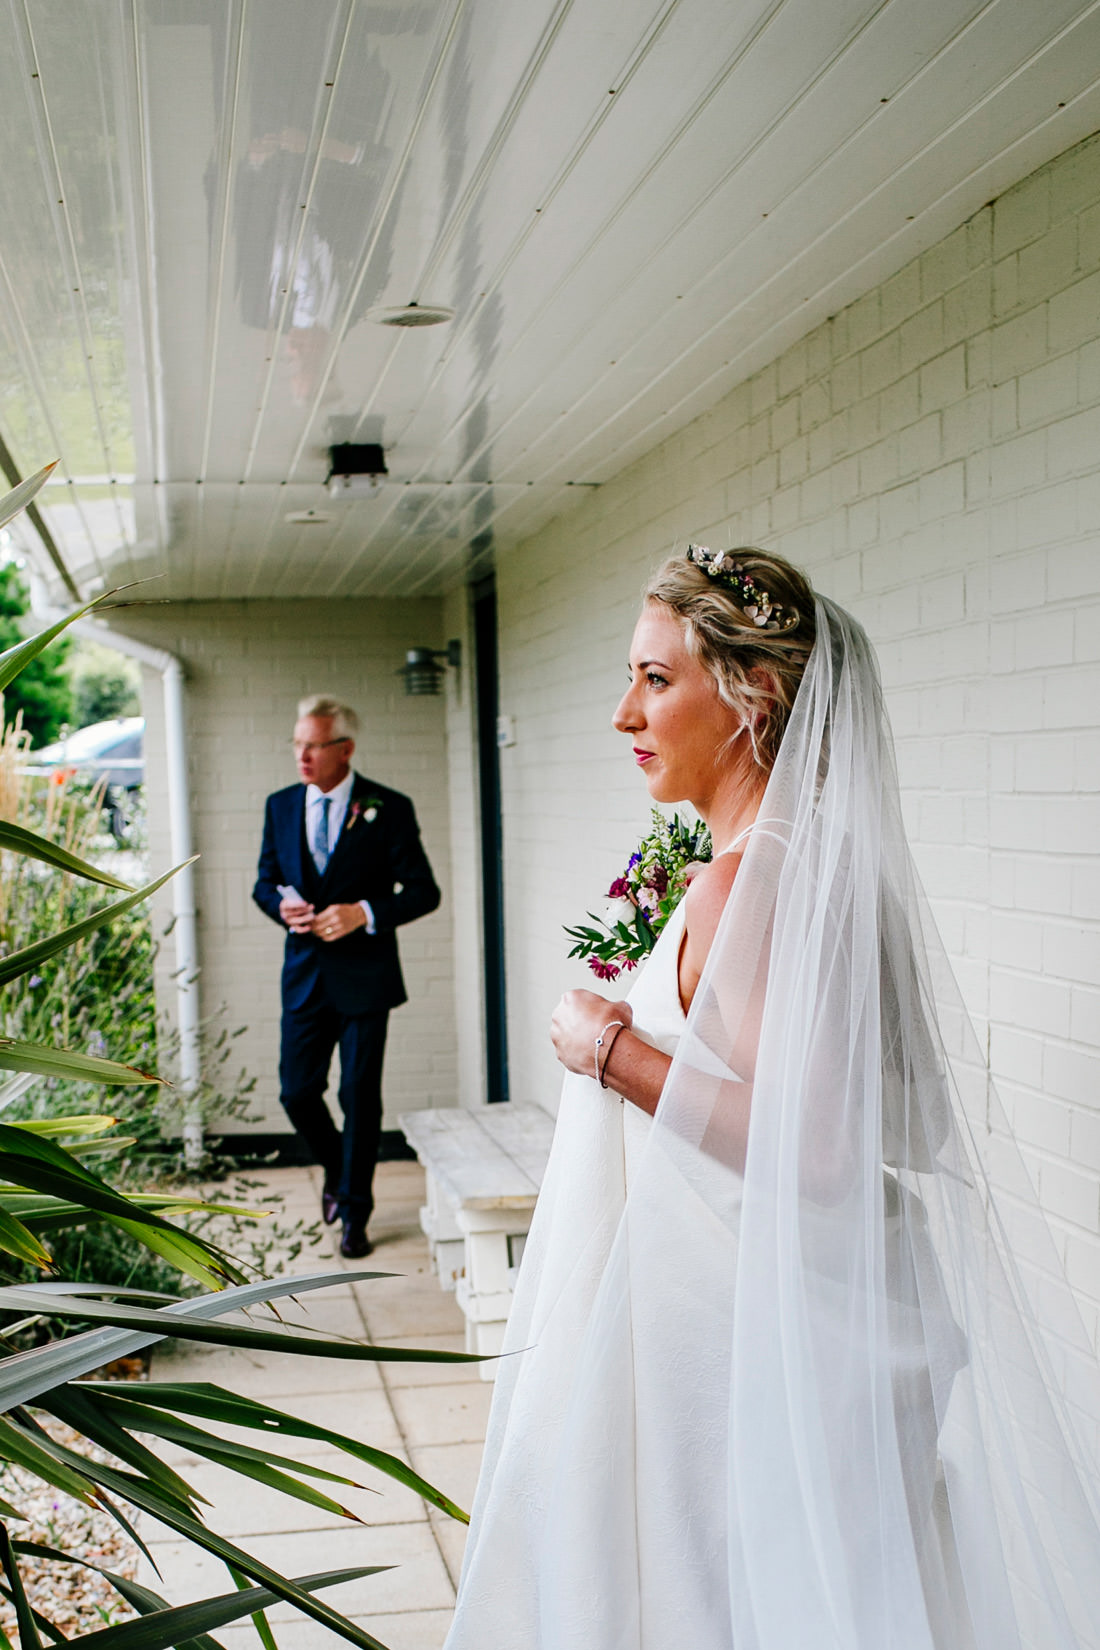 The-Gallivant-Camber-Sands-Beach-Kent-wedding-photographer-Epic-Love-Story-043